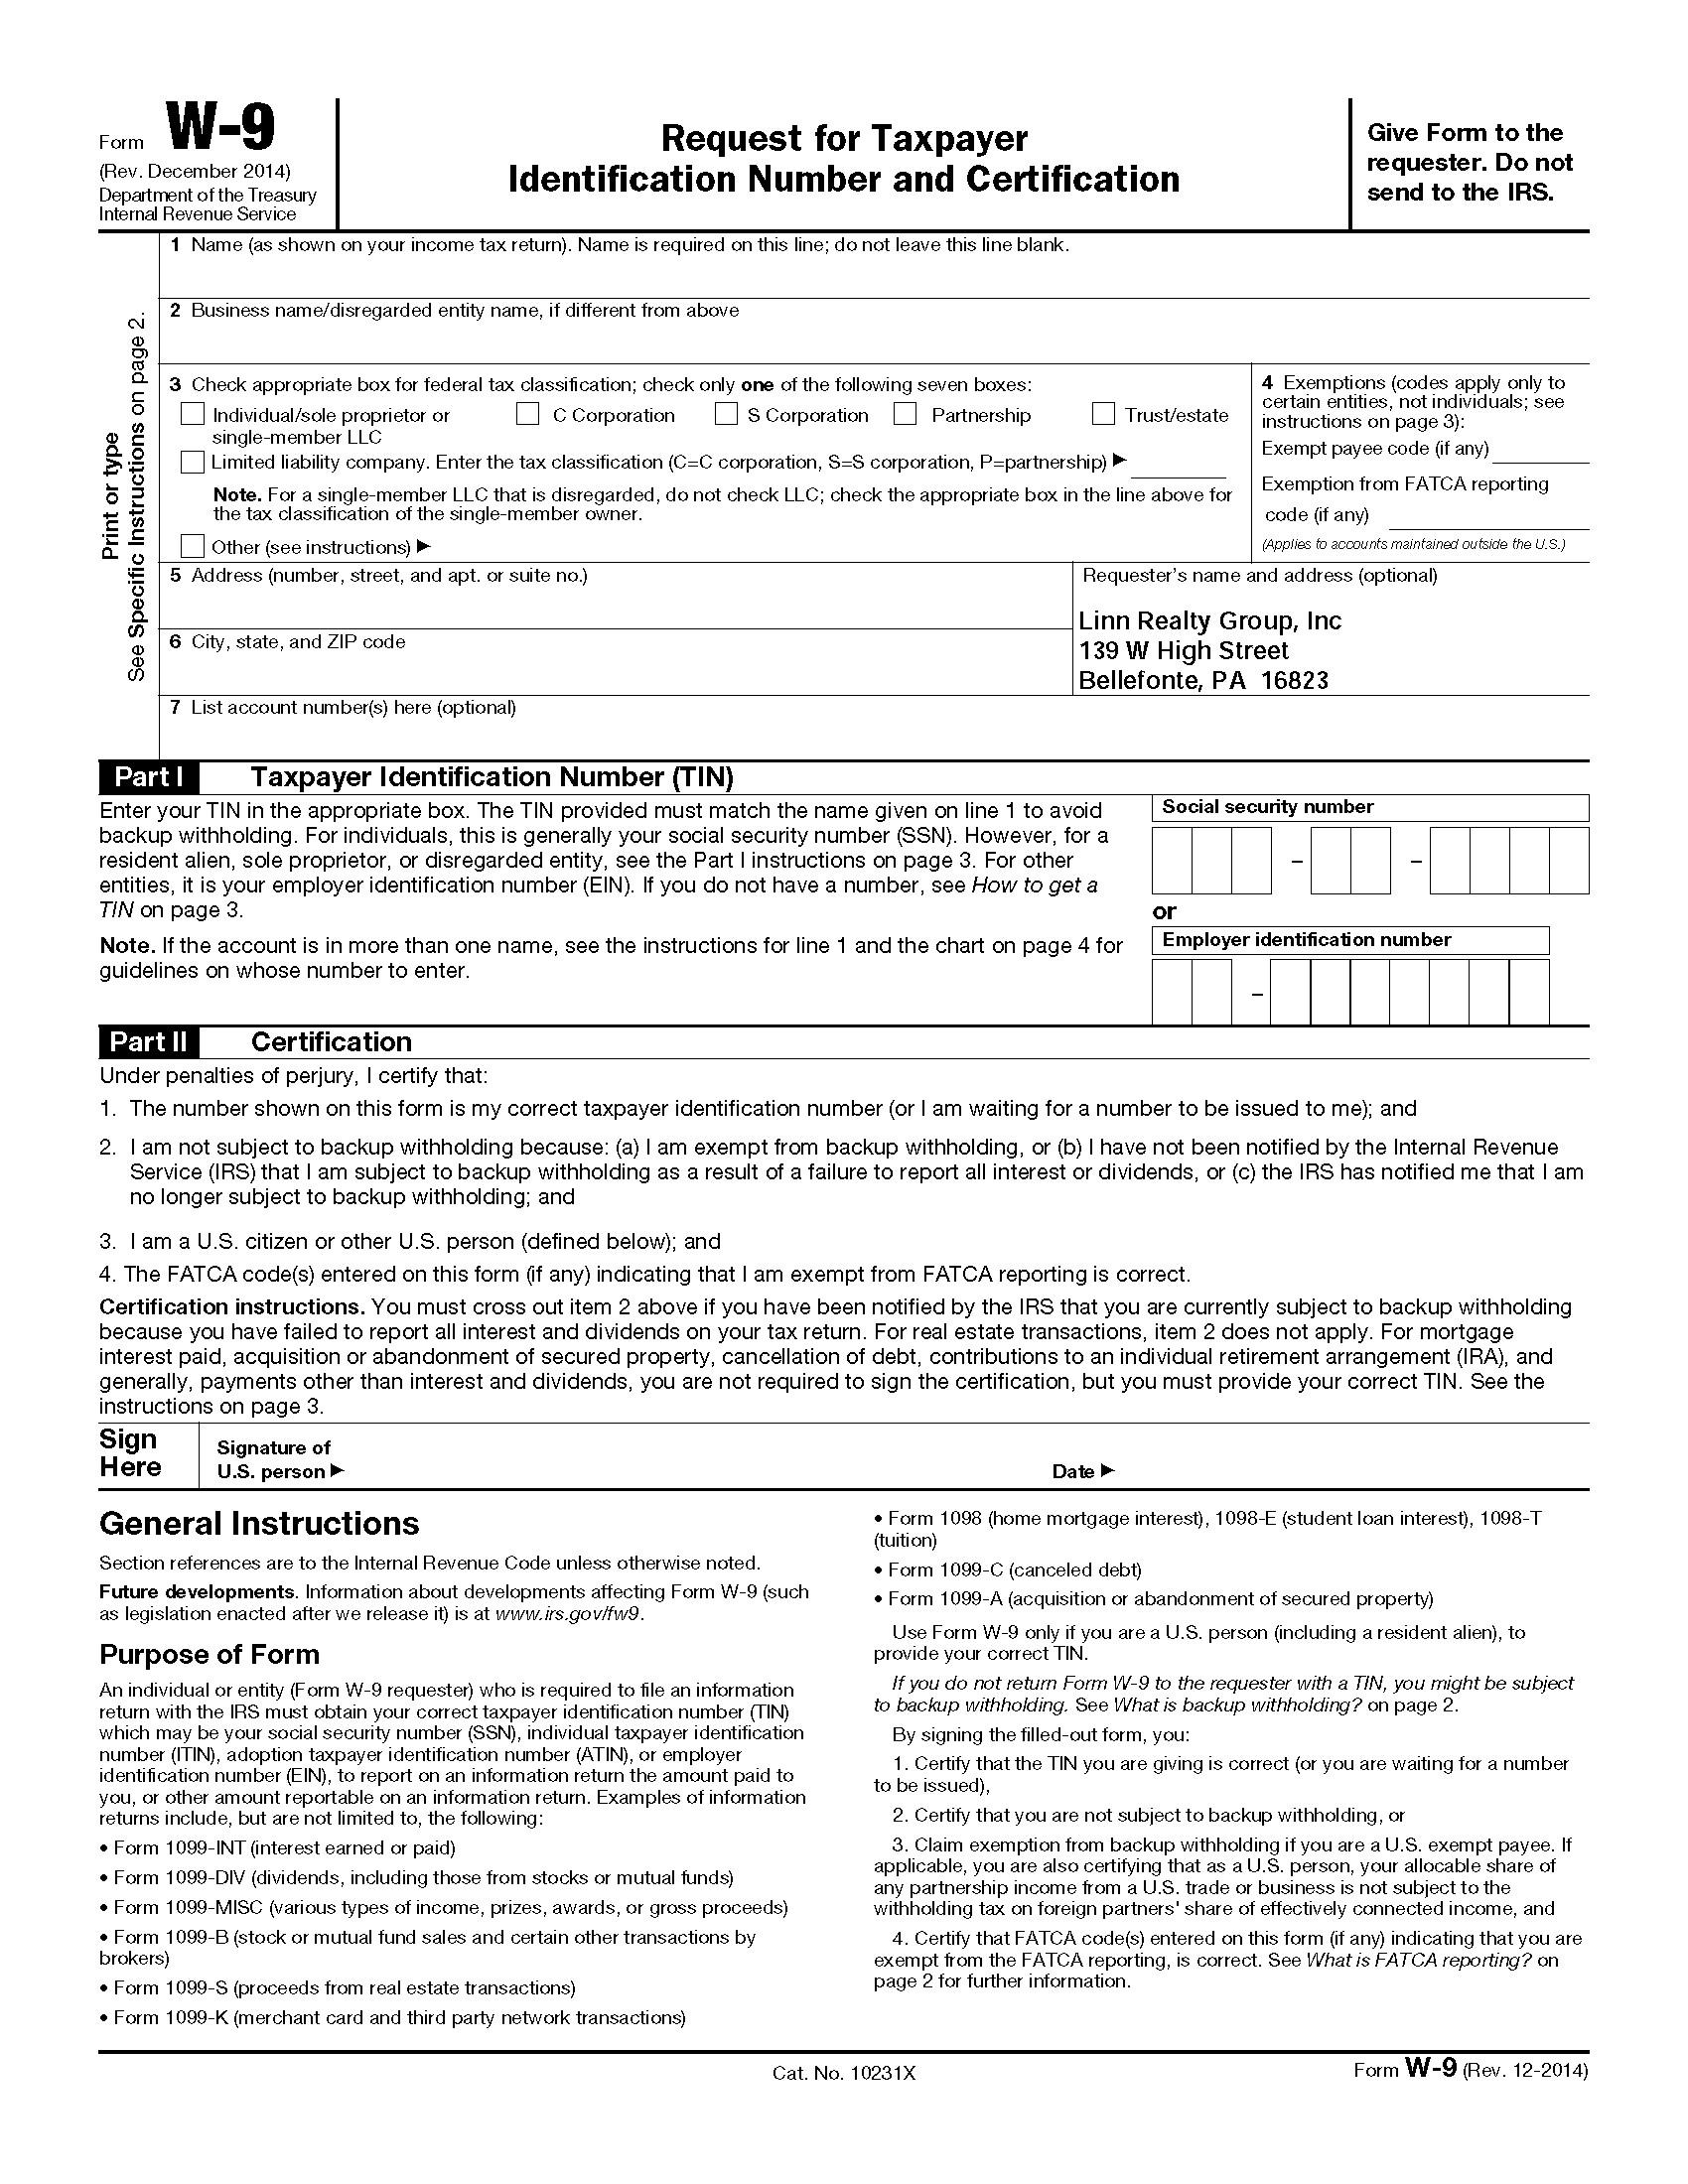 W-9 Form 2021 Printable Pdf | Calendar Template Printable pertaining to W9 Forms 2021 Printable